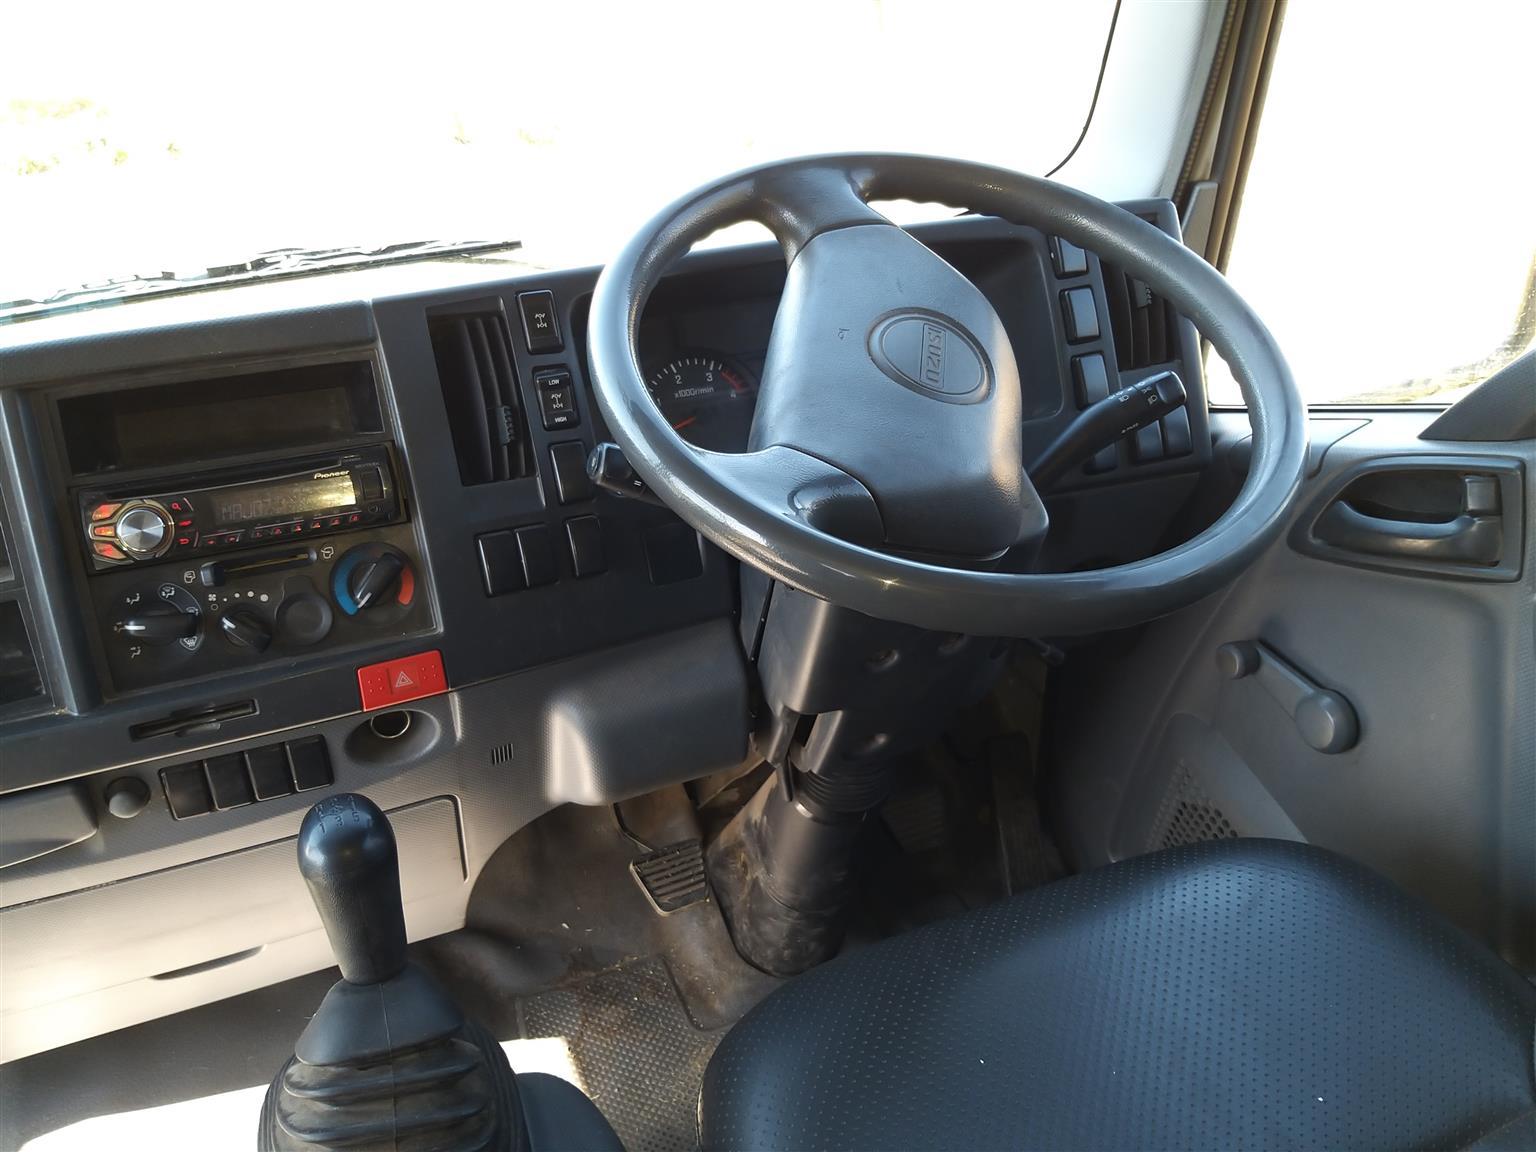 Isuzu NPS 300 Crew cab 4x4